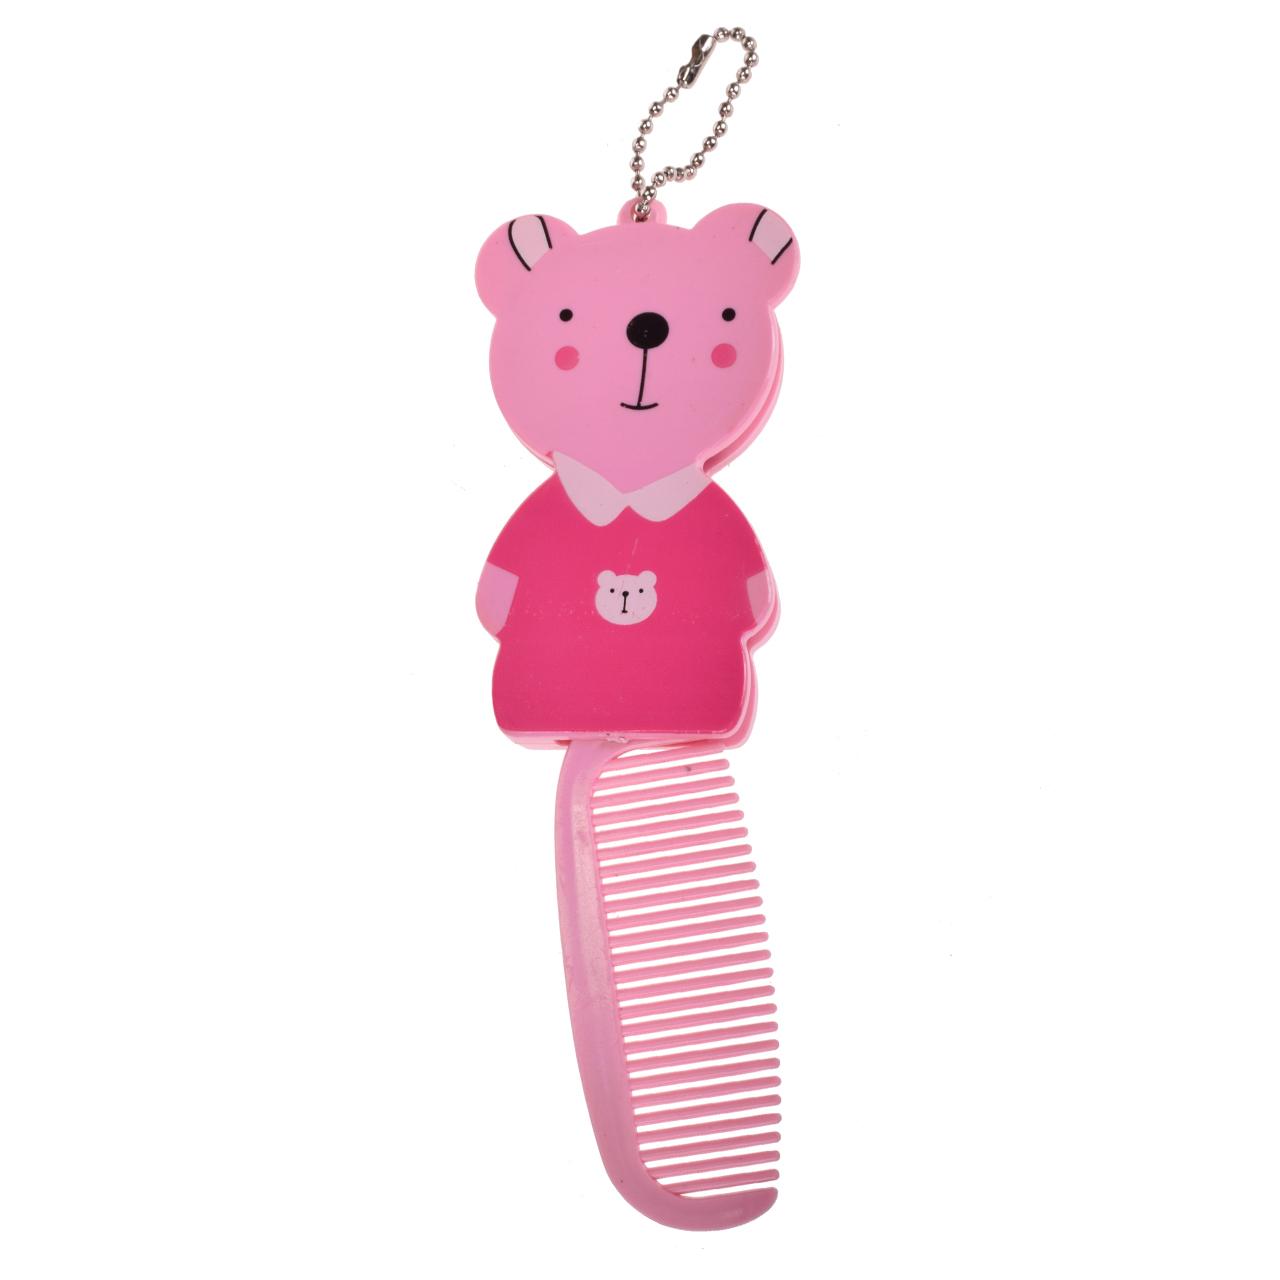 شانه کودک مدل Bear 1